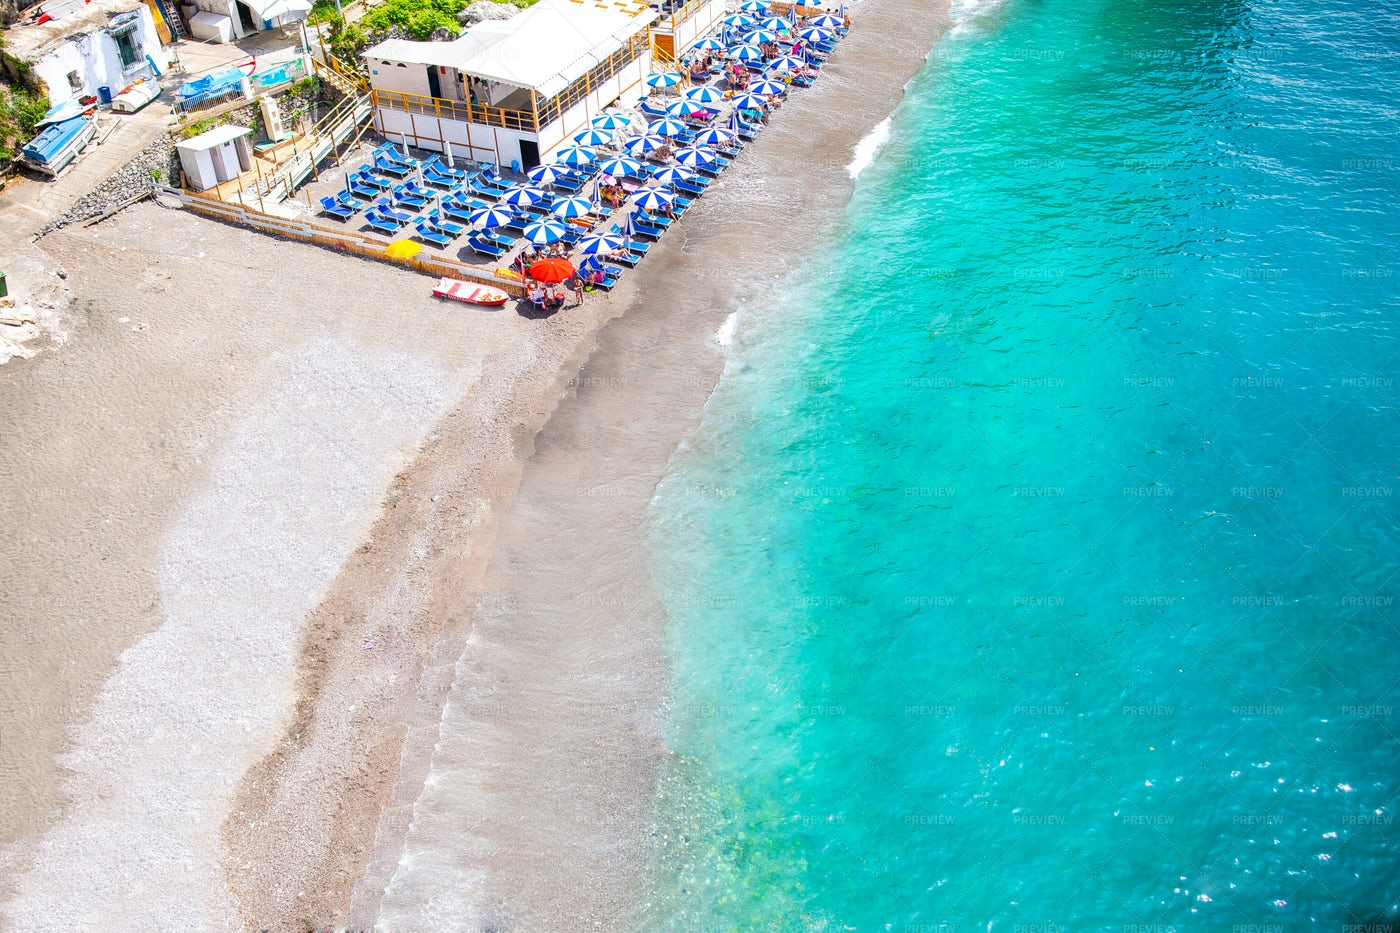 Beach On The Adriatic Sea: Stock Photos